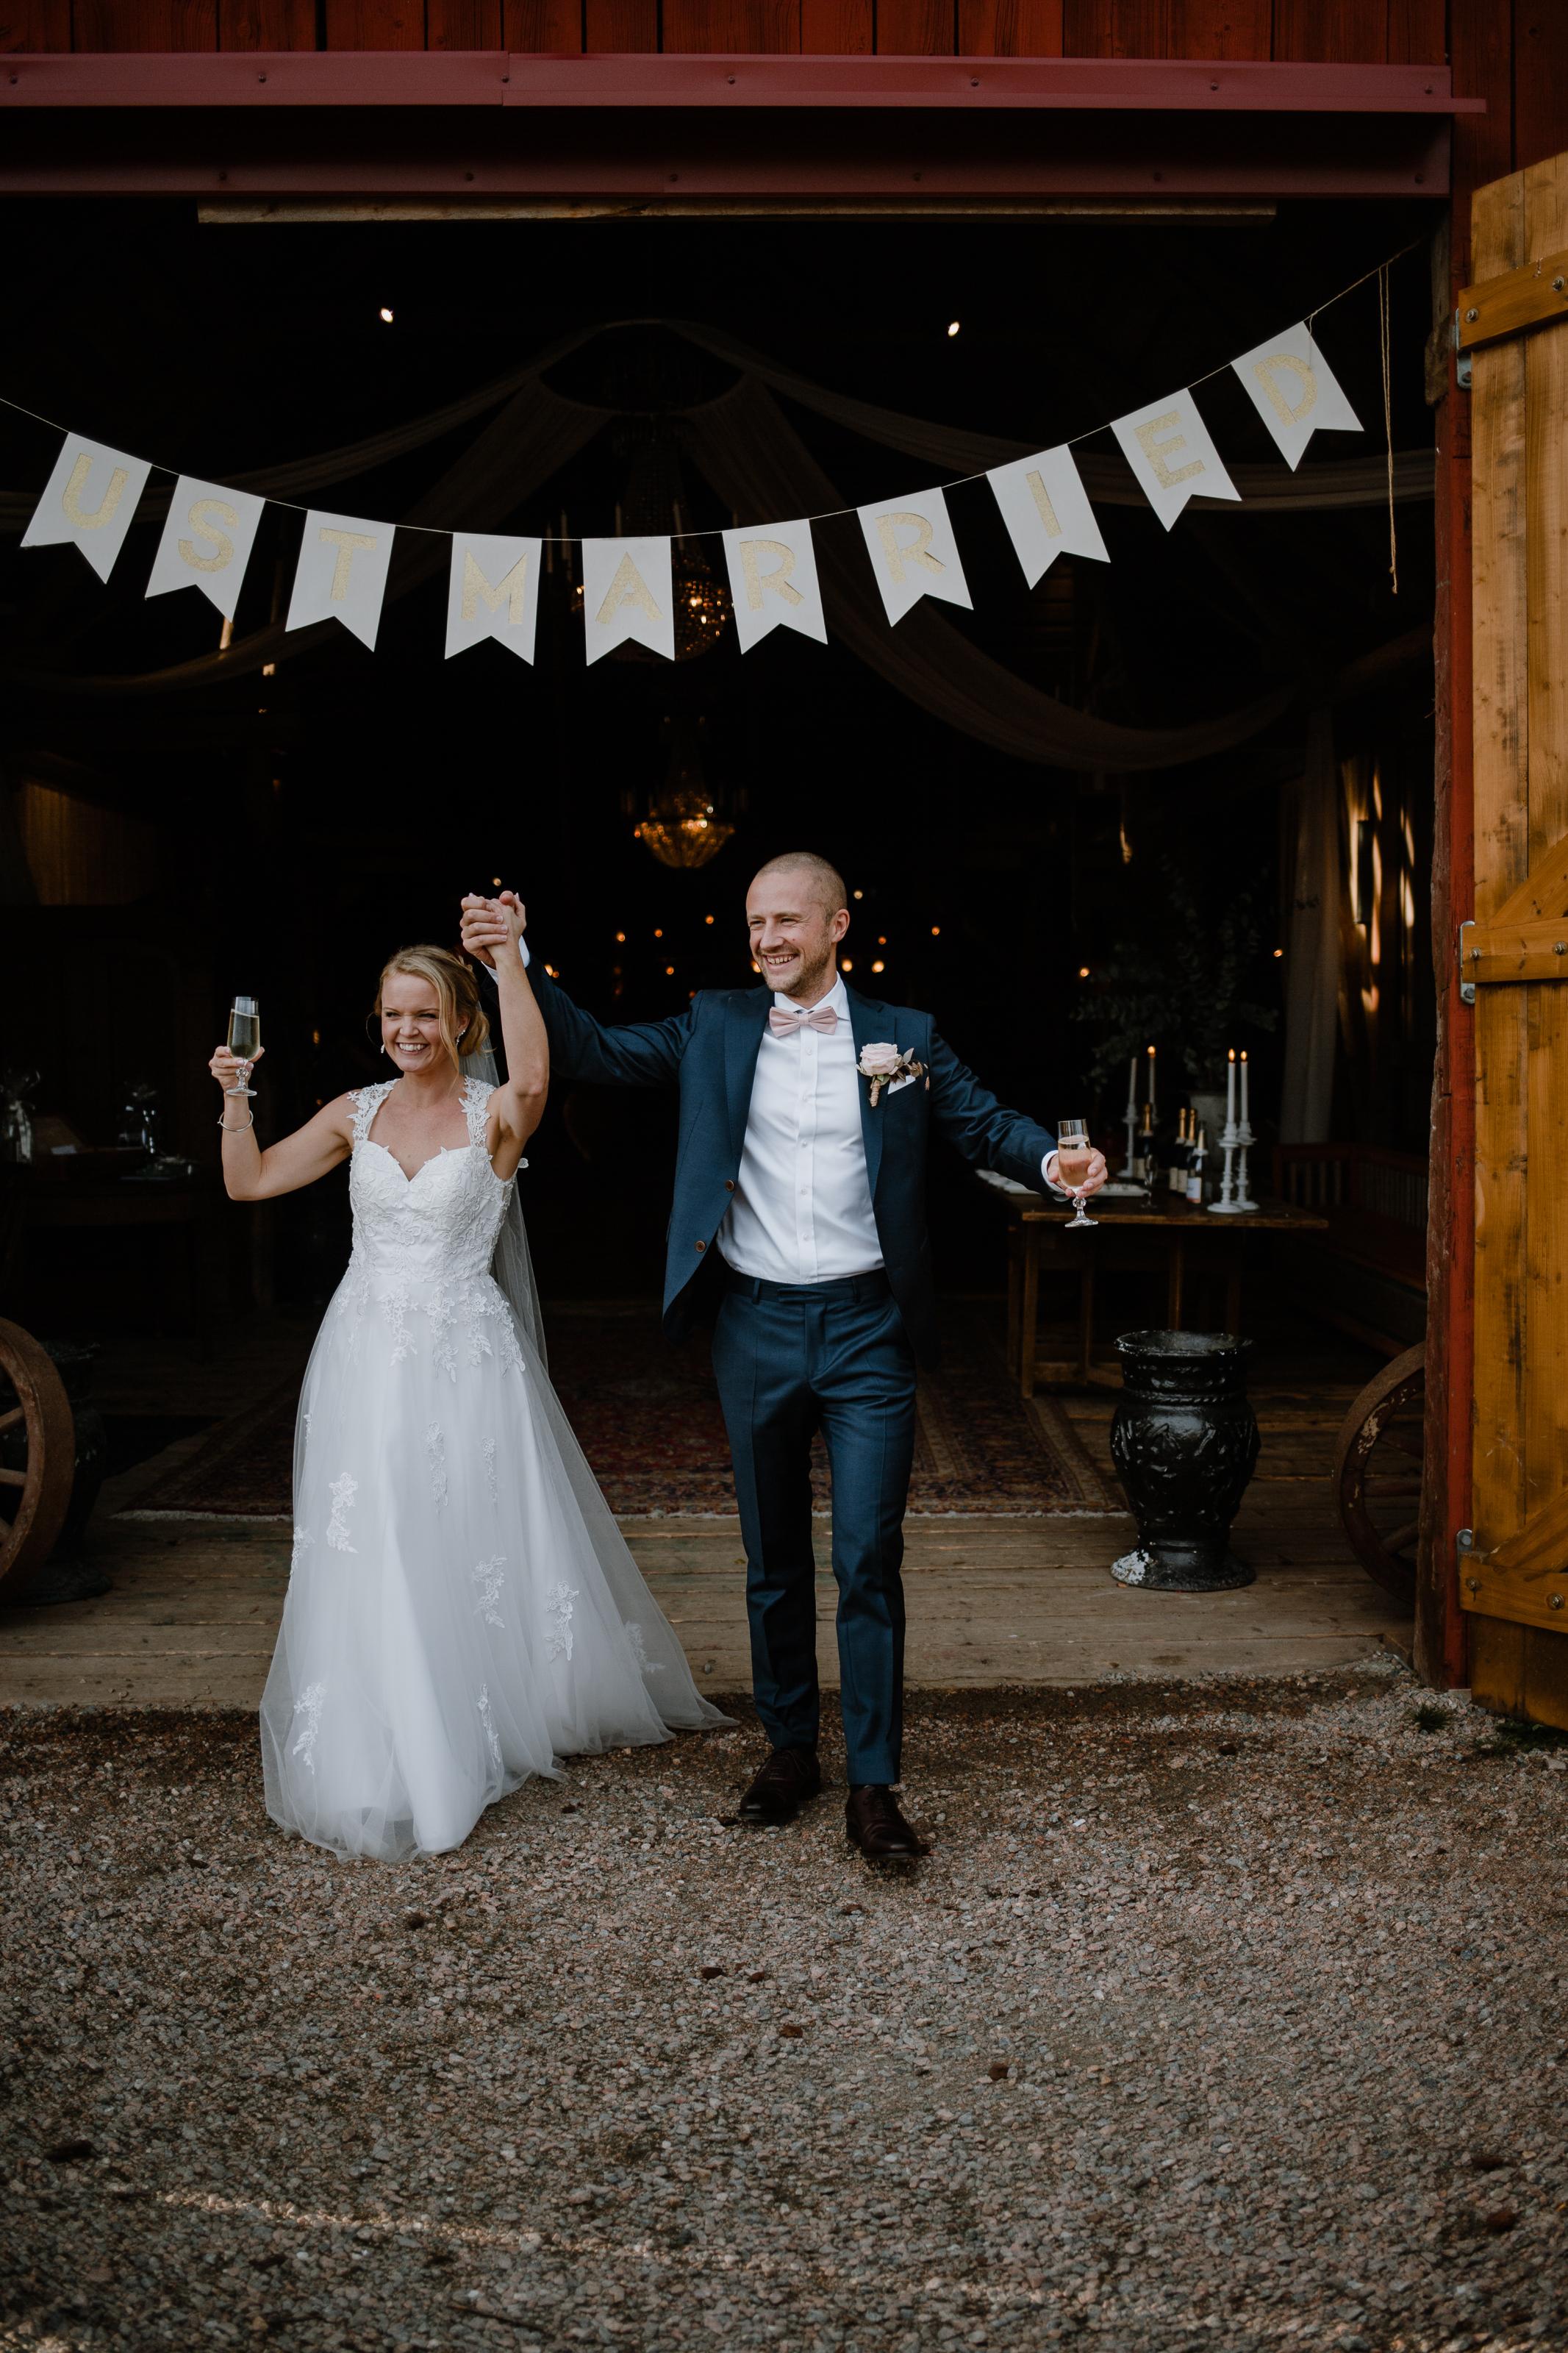 Bröllopsfotograf-Uddetorp Säteri-Höstbröllop-Fotograf Emilia- Bröllopsfotograf Borås-50.jpg